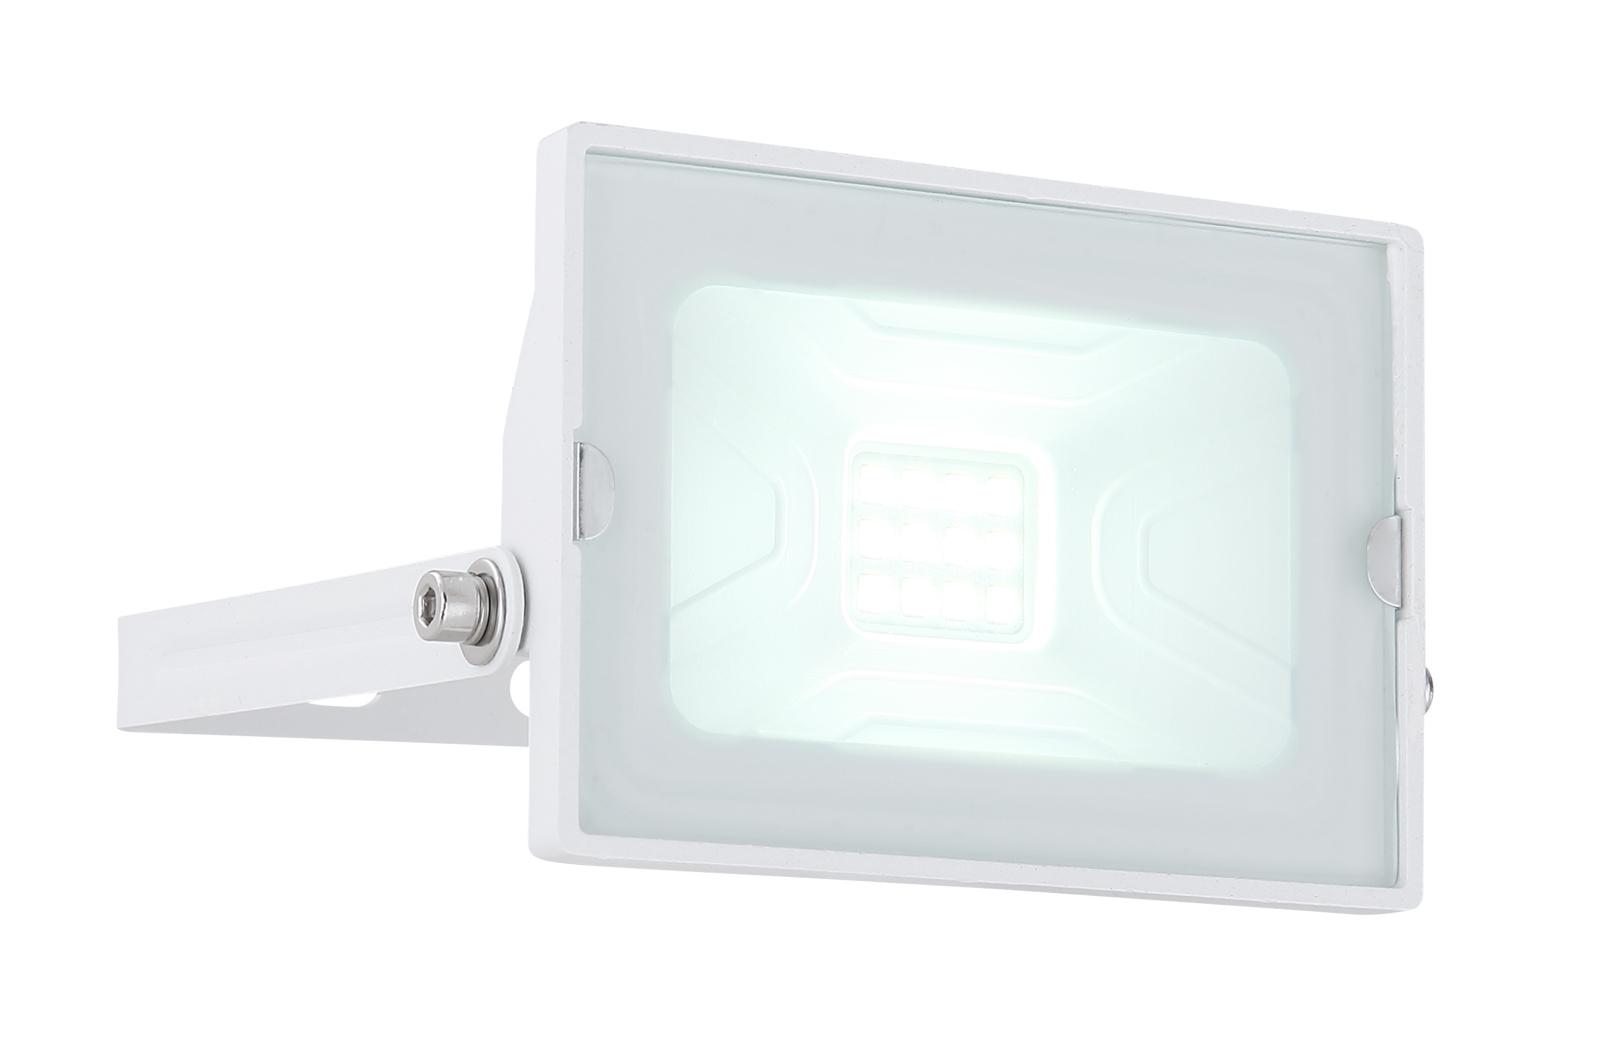 Kültéri reflektor fehér alumínium, üveg búrával. IP65 inkl. 1xLED 10W 230V, 750lm, 6000K